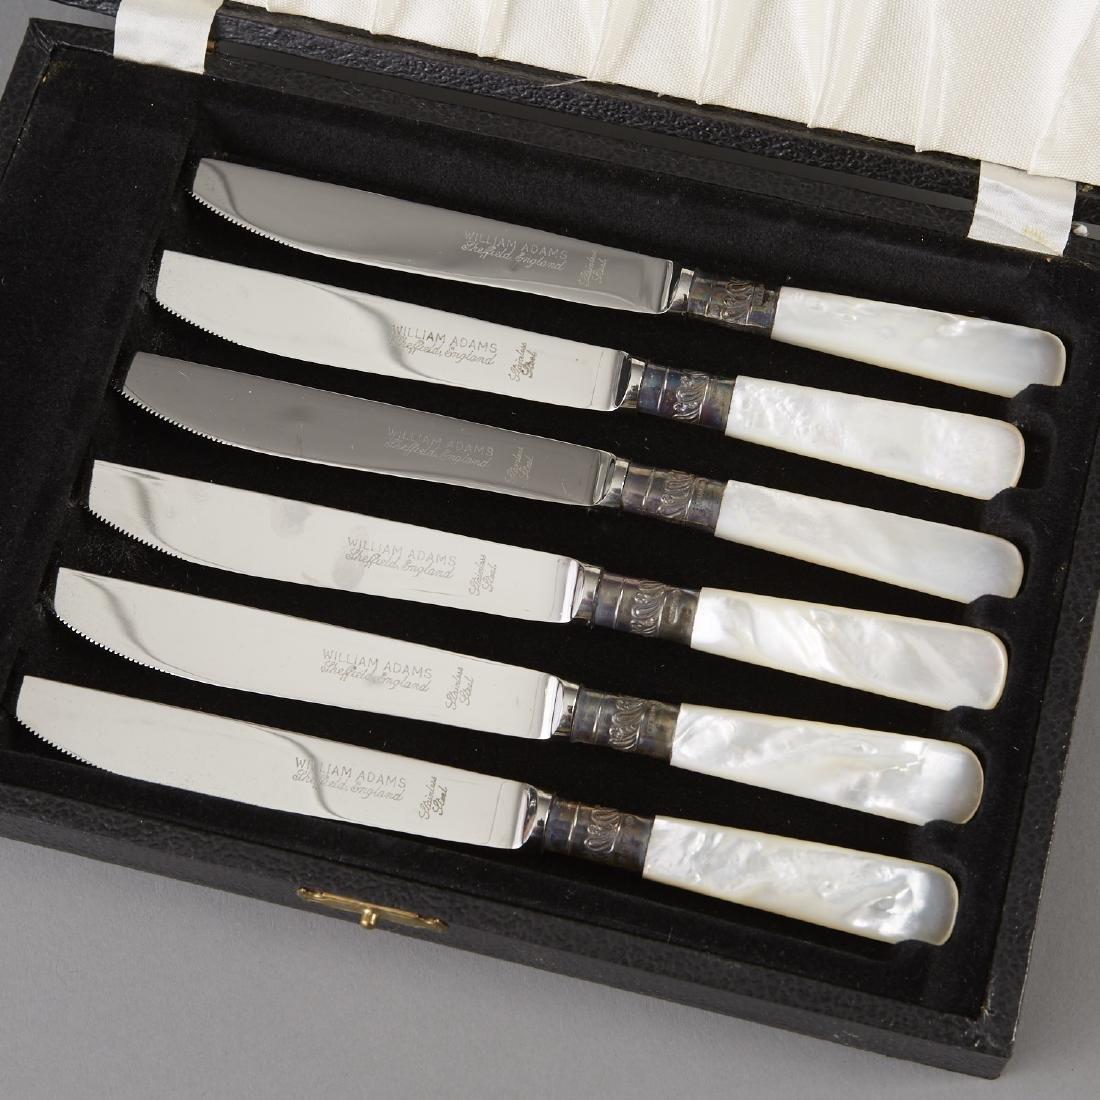 3 Cases of William Adams Knives - 3